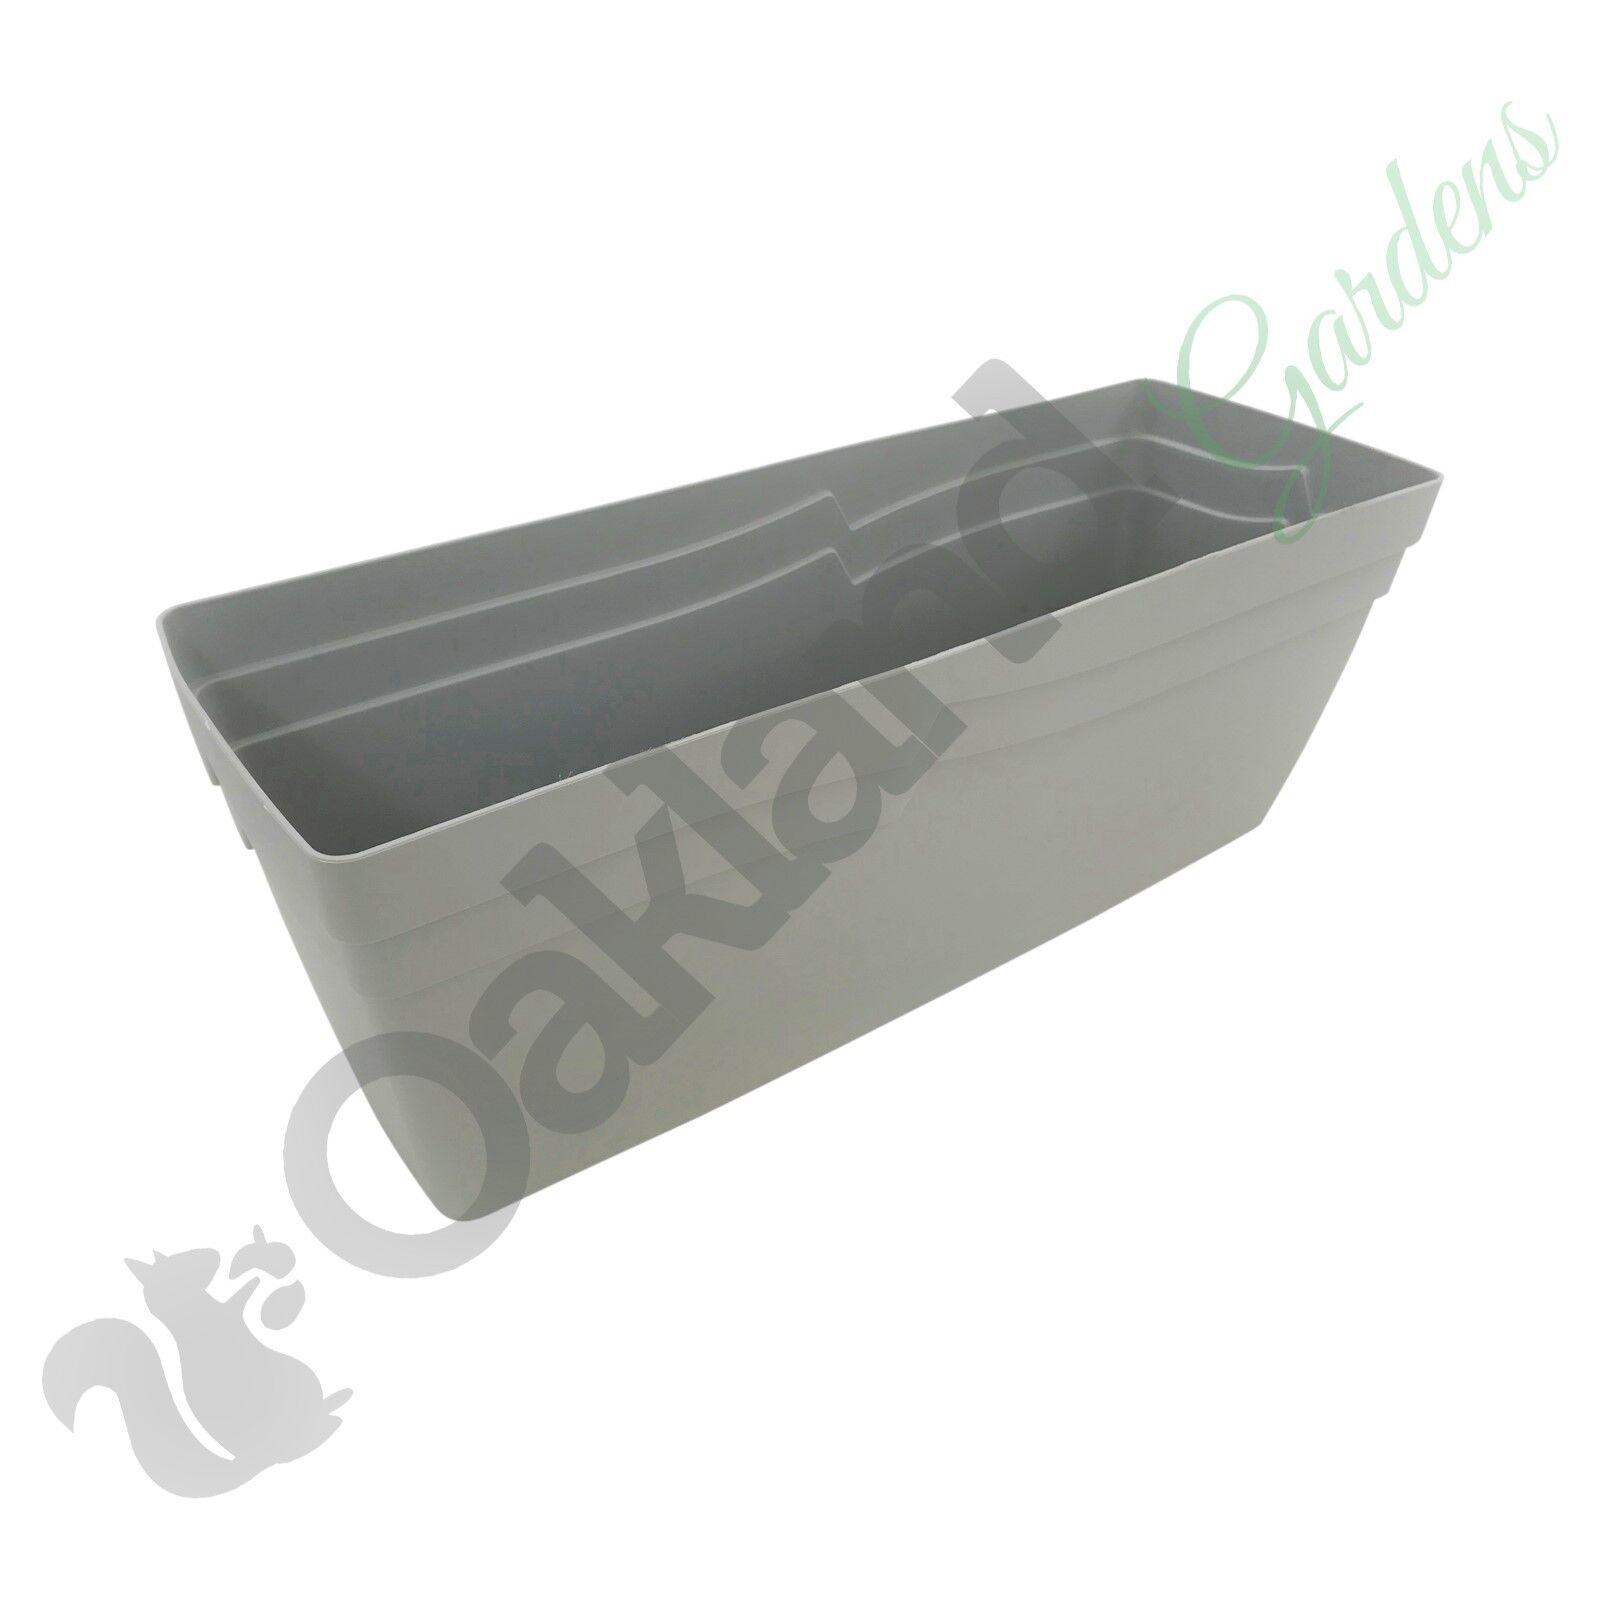 2 x 49cm Self Watering Stone Grey Boston Window Box Coloured Planter Plant Pot